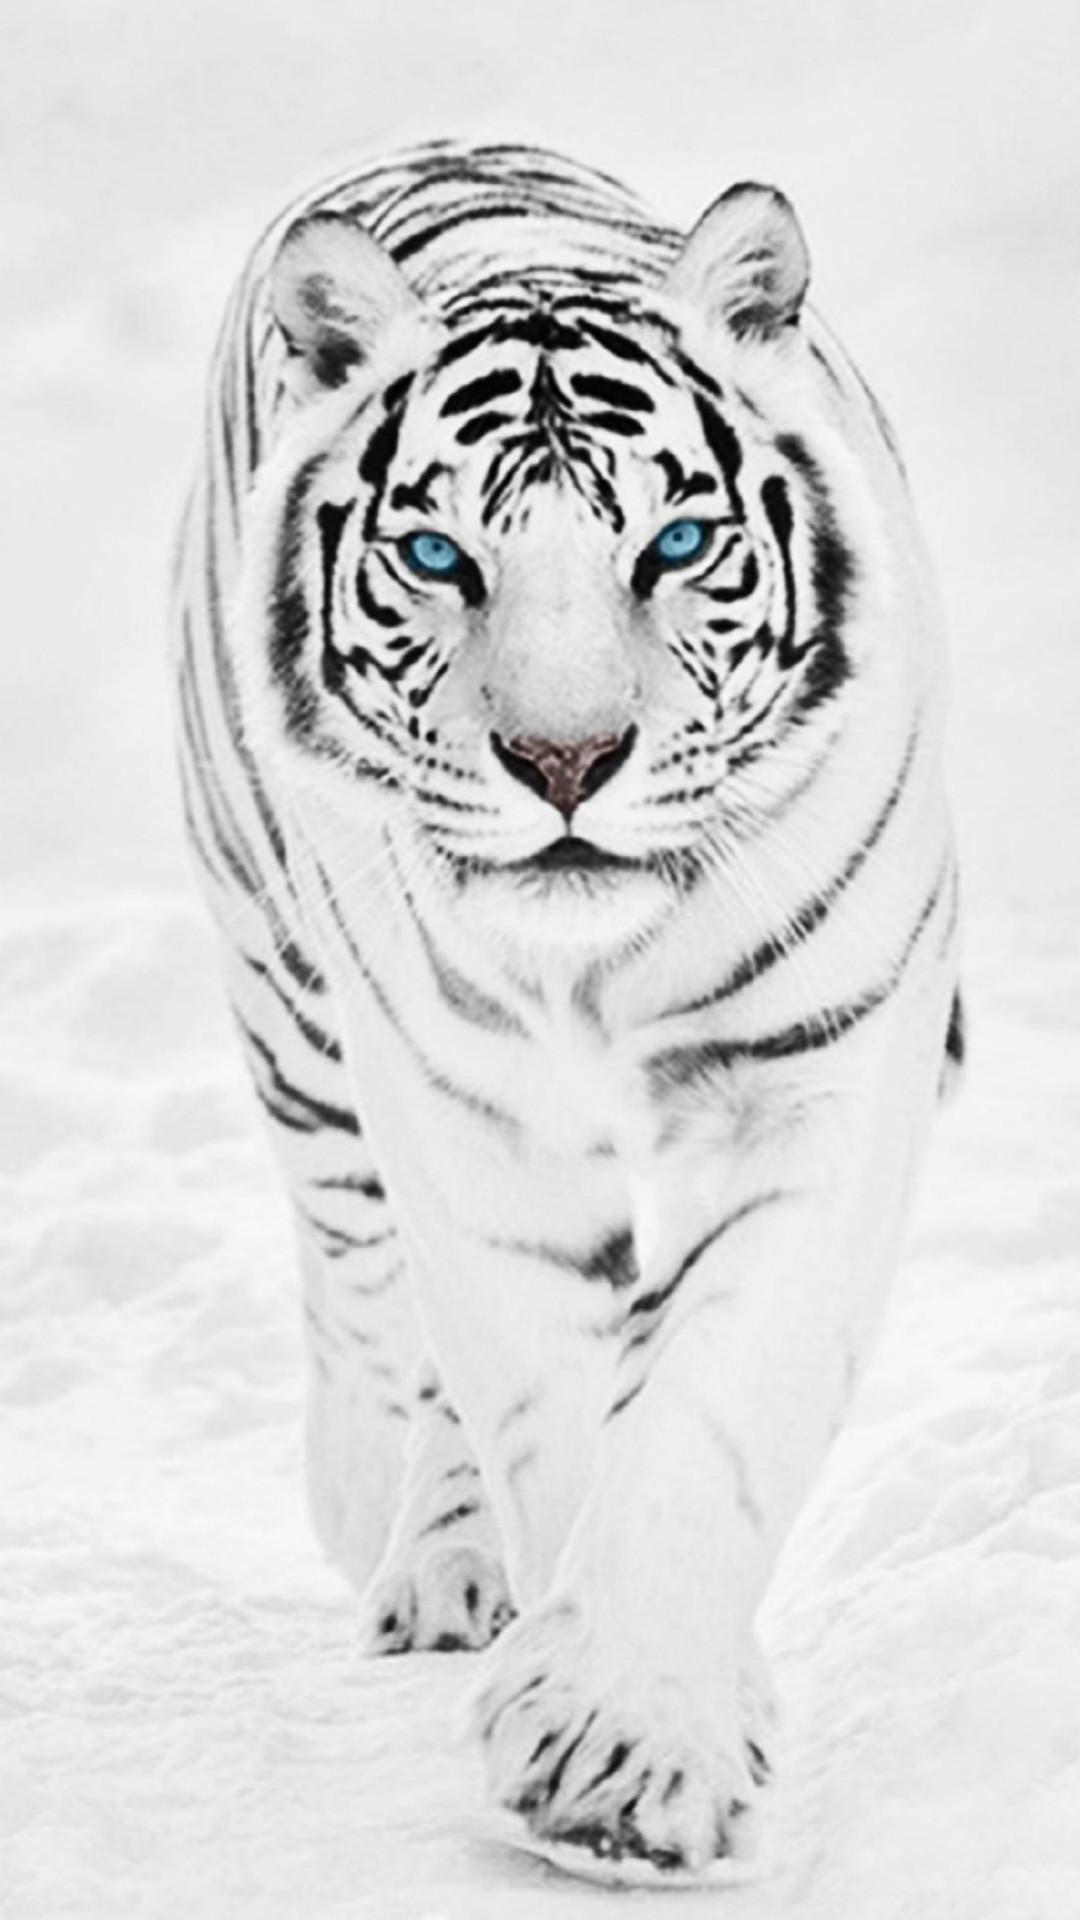 Siberian Tiger Wallpapers – Wallpaper Cave   Best Games Wallpapers    Pinterest   Tiger wallpaper and Wallpaper